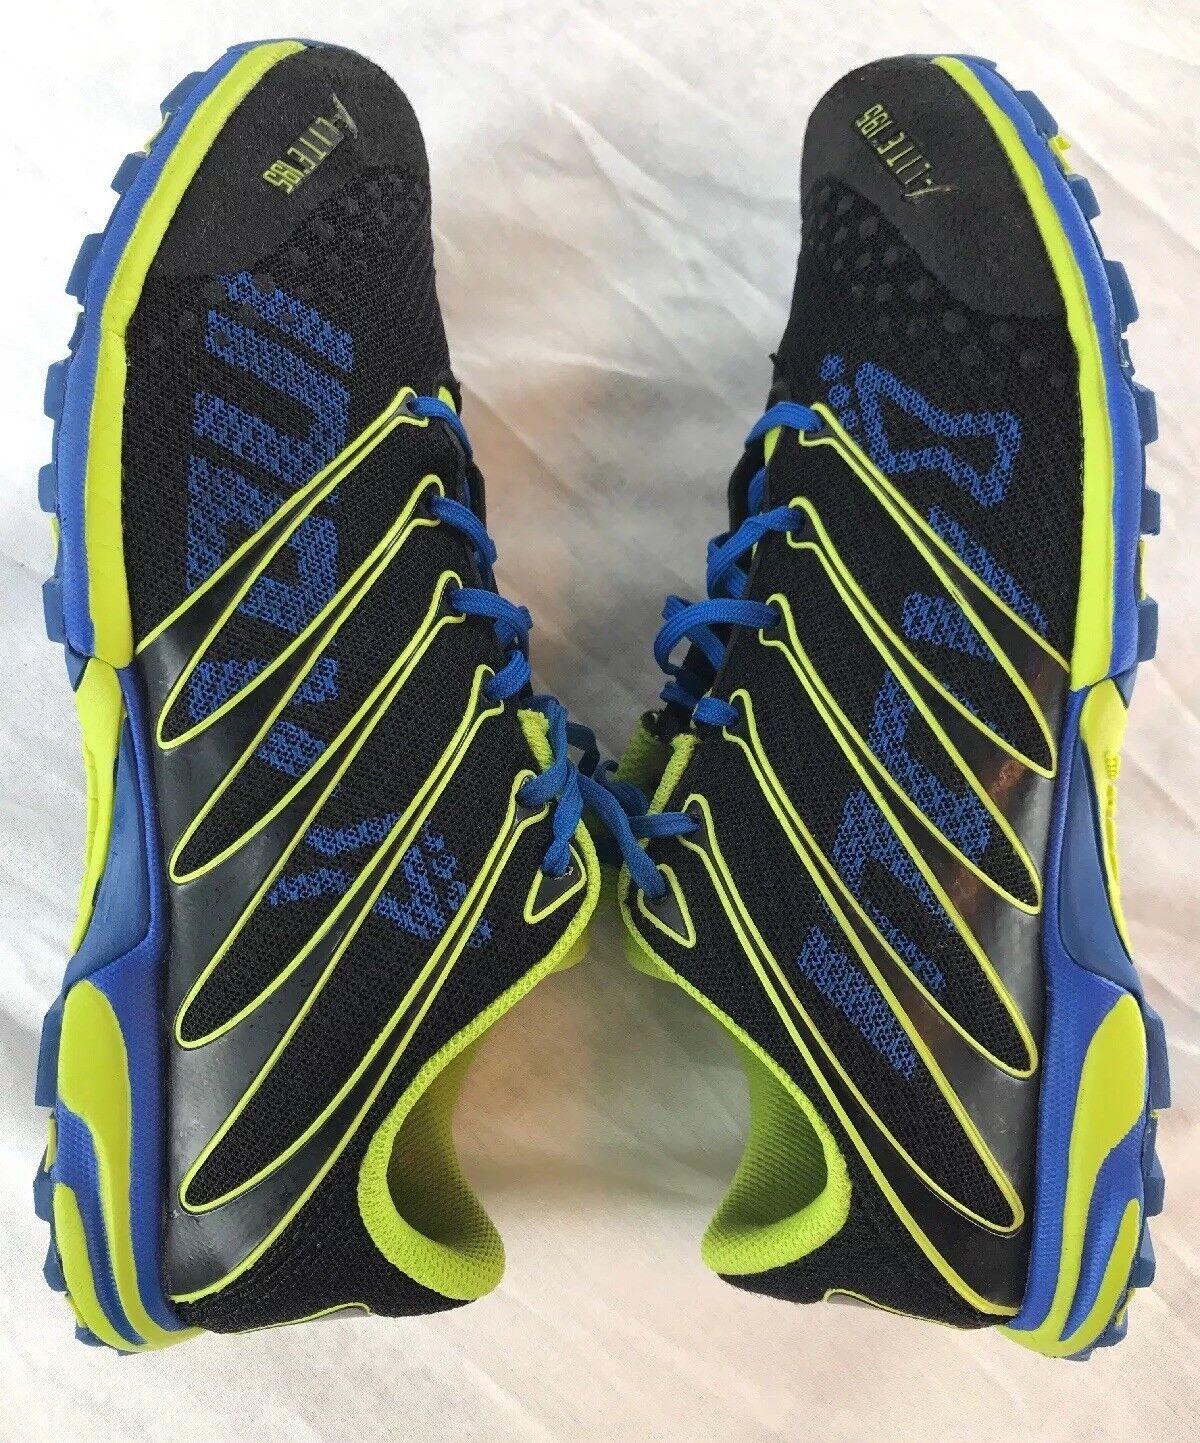 INOV-8 F-Lite 195 Performance Athletic Cross Training shoes Men 7 Women 8.5